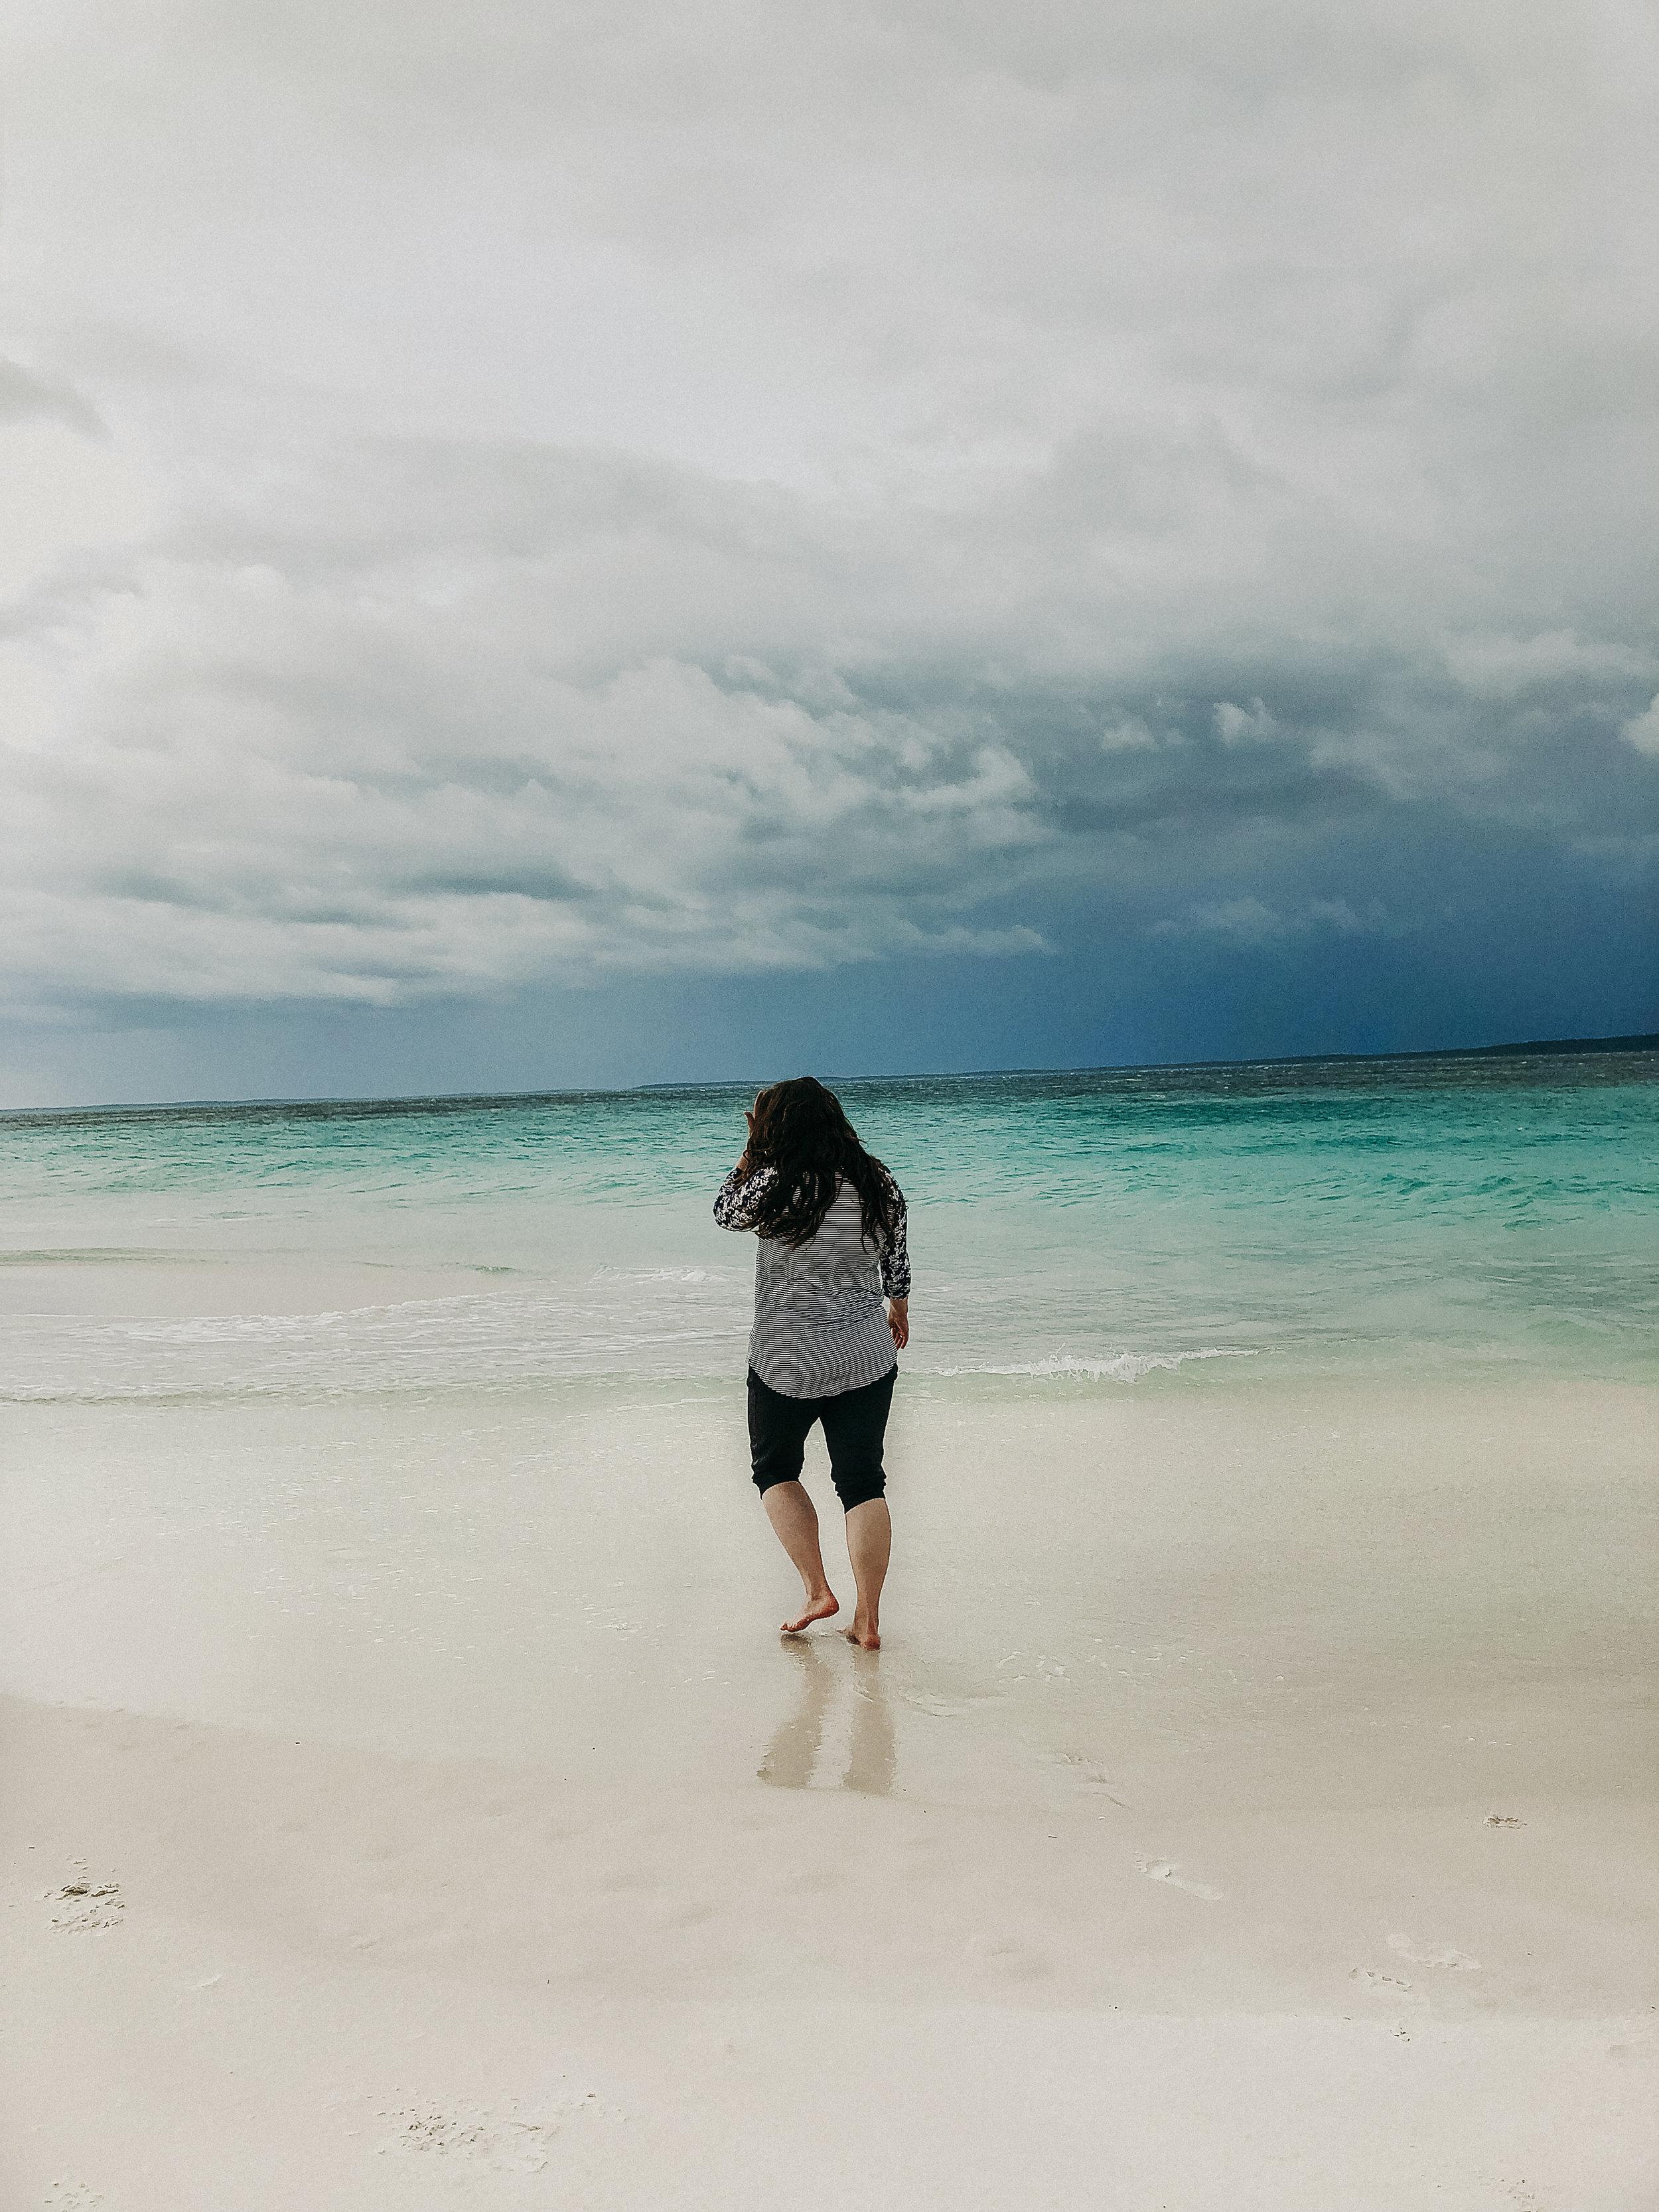 jervis-bay-australia-hyams-beach-whitest-snow-in-the-world-2.jpg